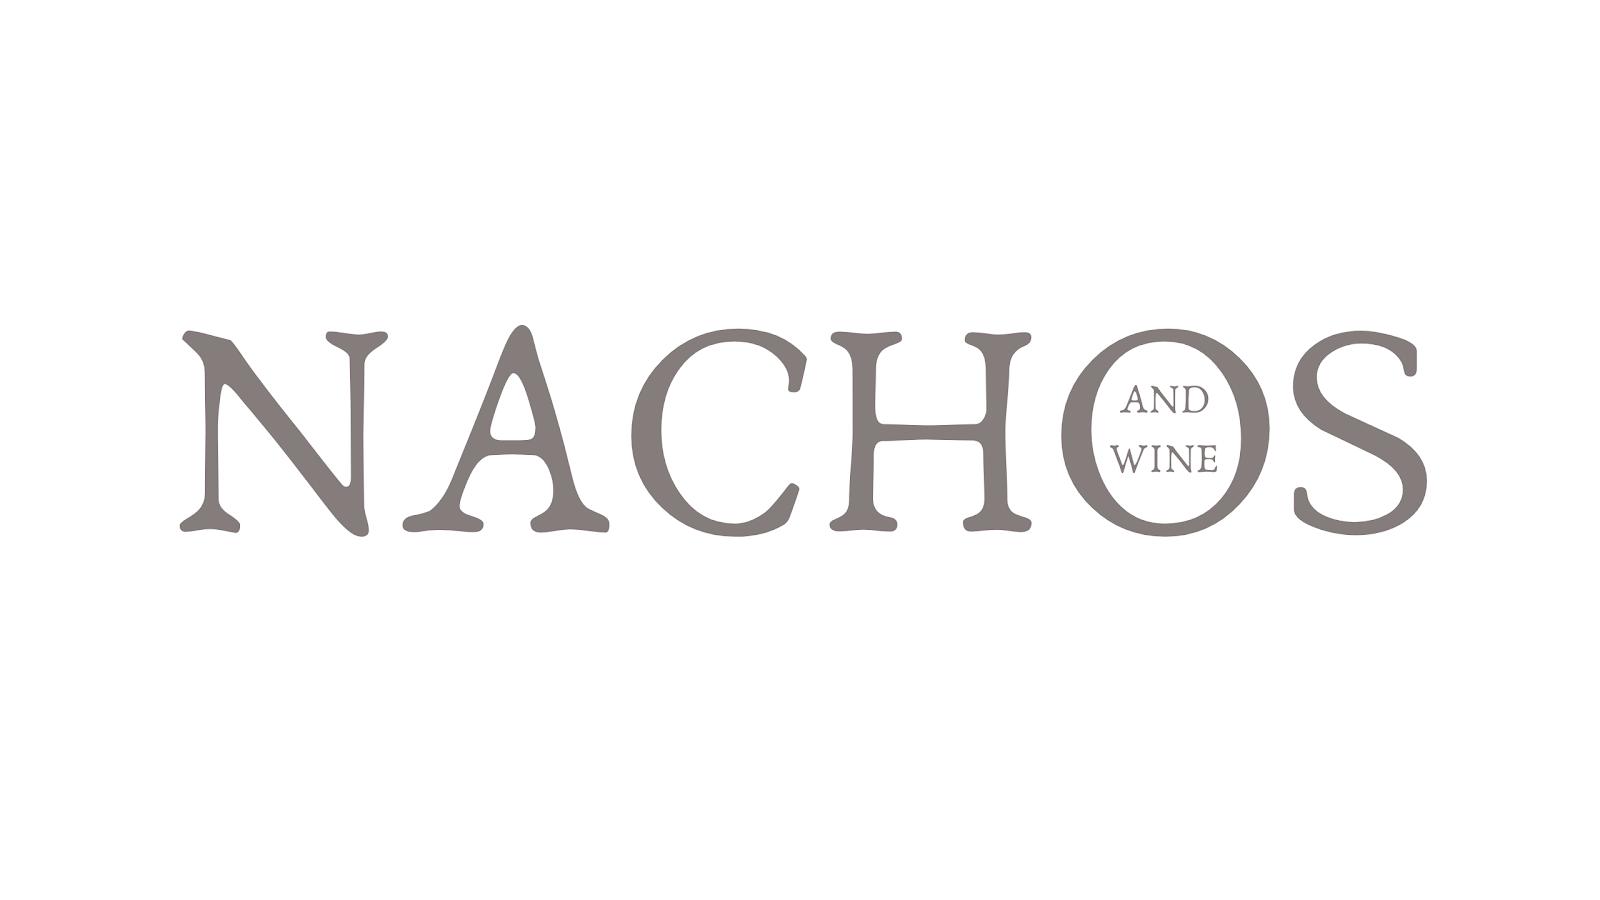 Nachos and Wine